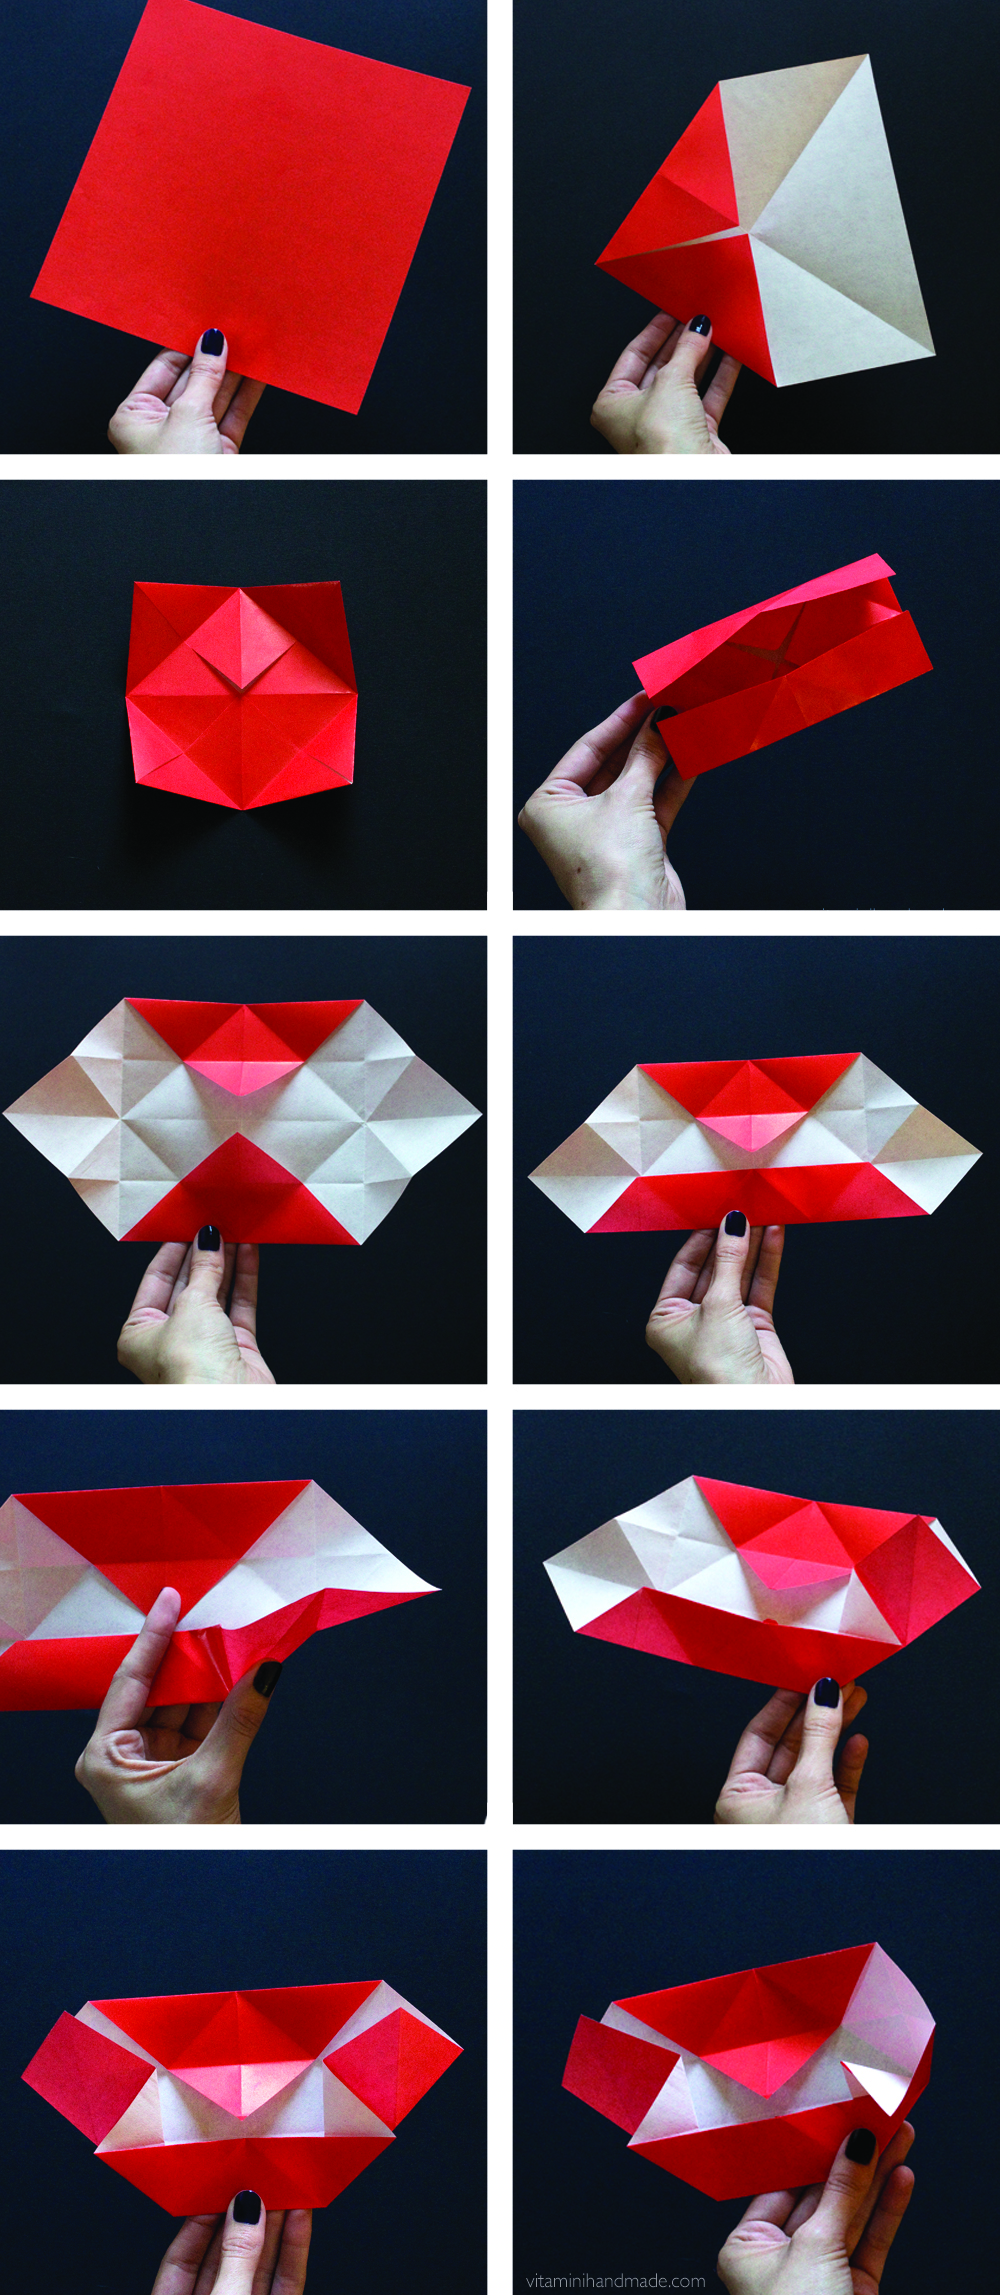 Оригами из бумаги вампир